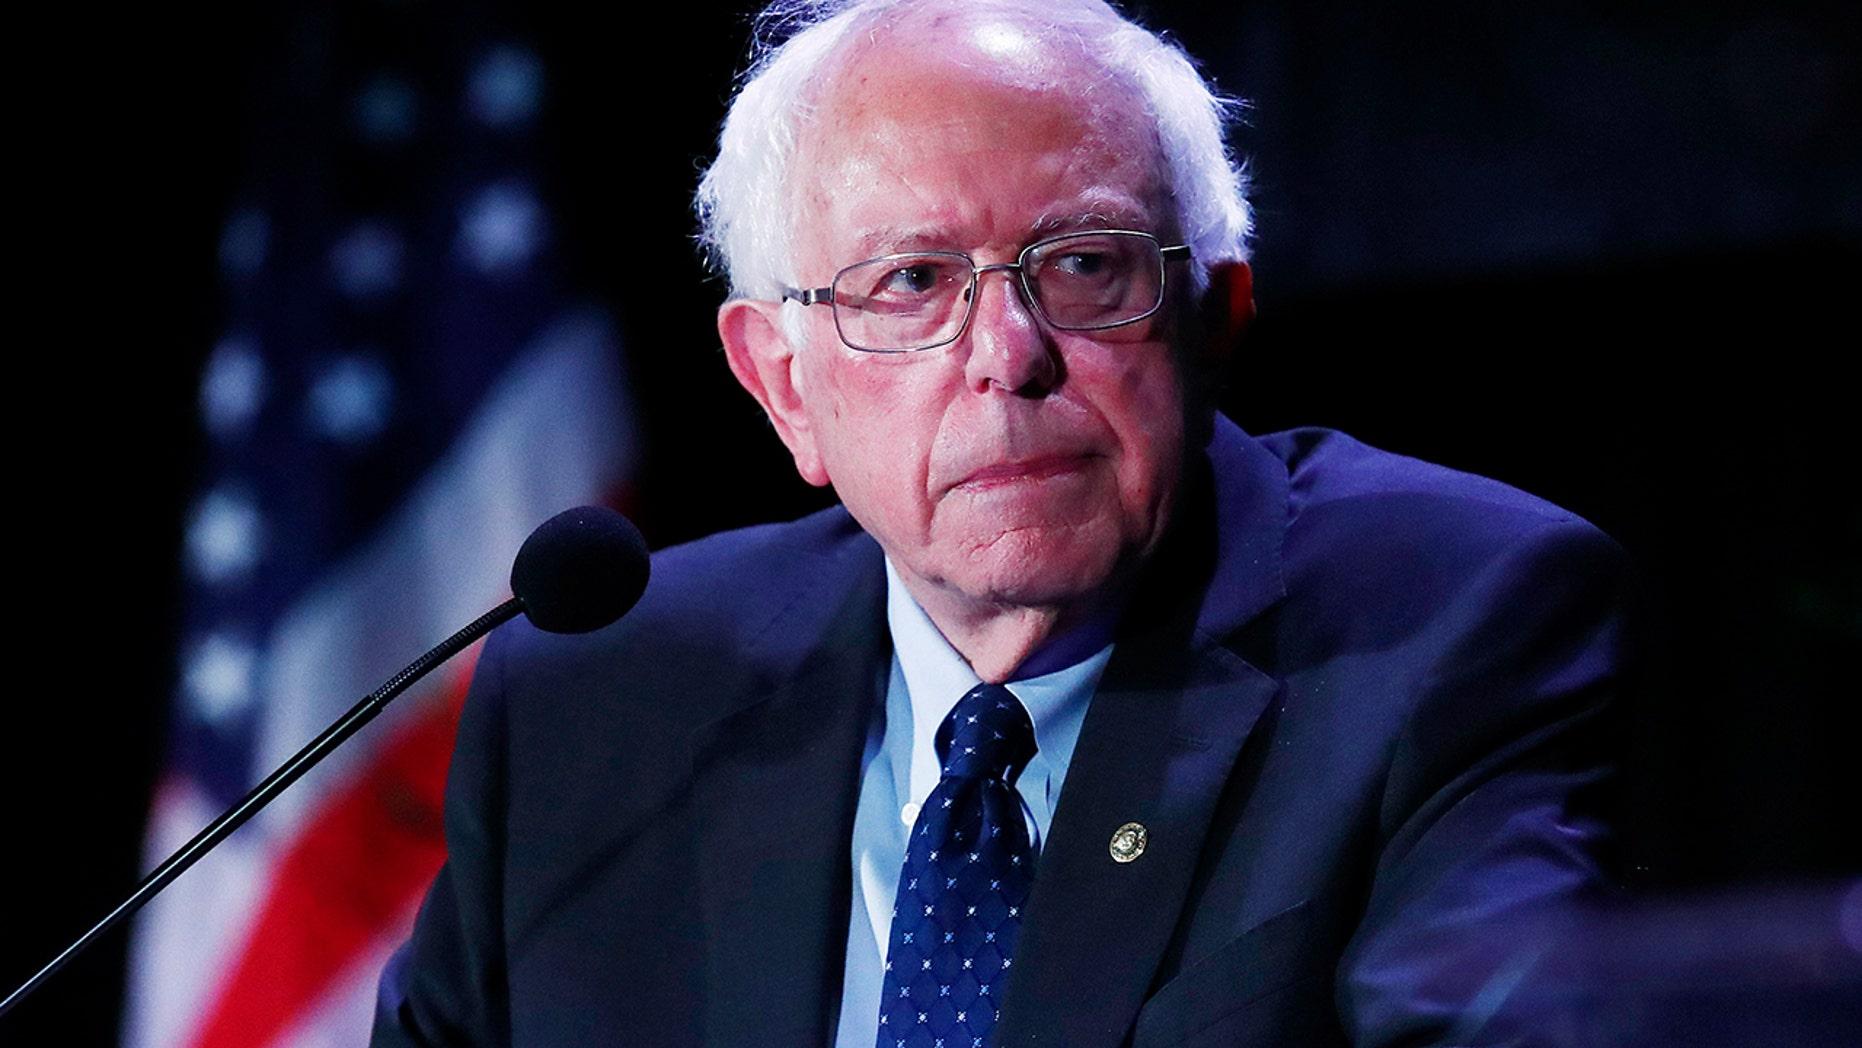 Westlake Legal Group Bernie-Sanders-thumb Sanders to propose eliminating all $1.6T of student debt in US: report Gerren Keith Gaynor fox-news/us/education/college fox-news/politics/2020-presidential-election fox-news/person/bernie-sanders fox news fnc/politics fnc article 4fe58db5-0df8-5df2-83f2-957caa1c9f98